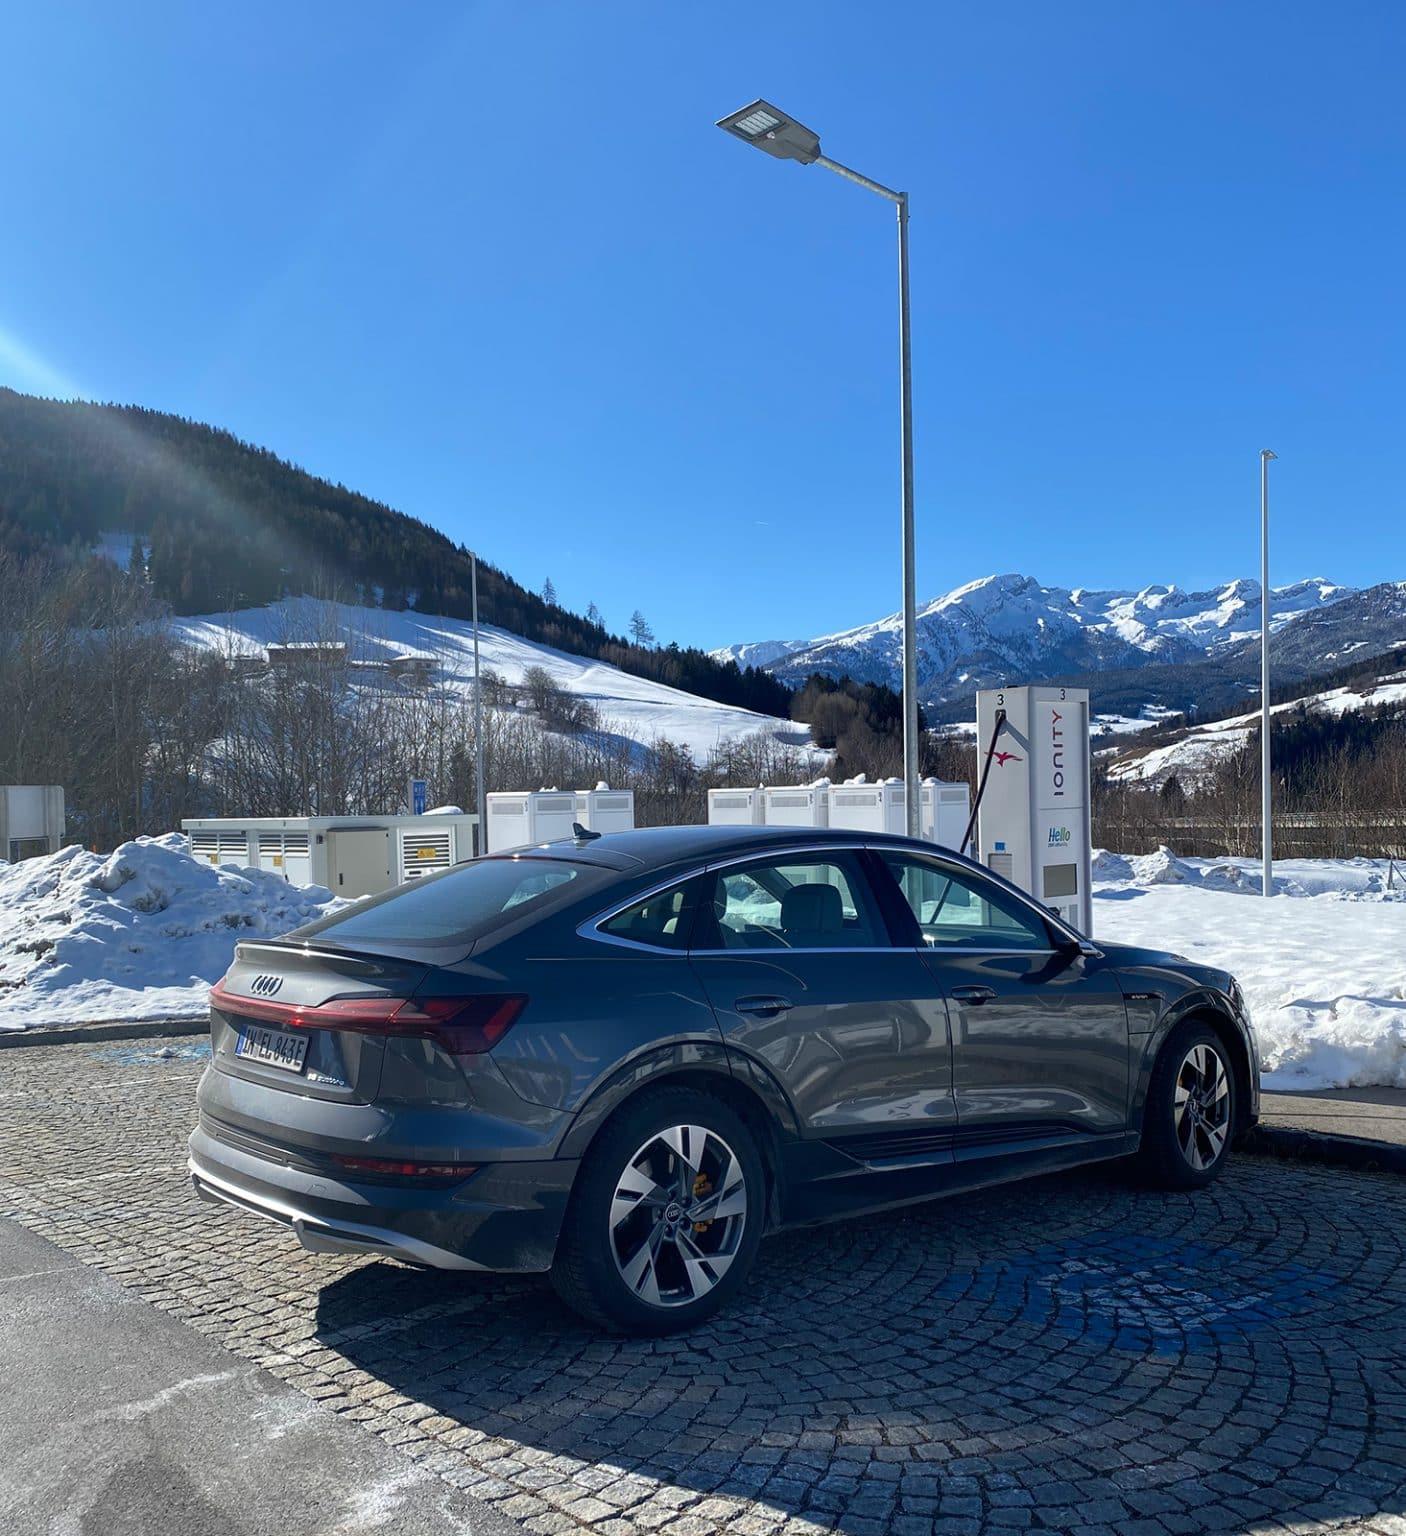 Audi-etron-erfahrungsbericht2